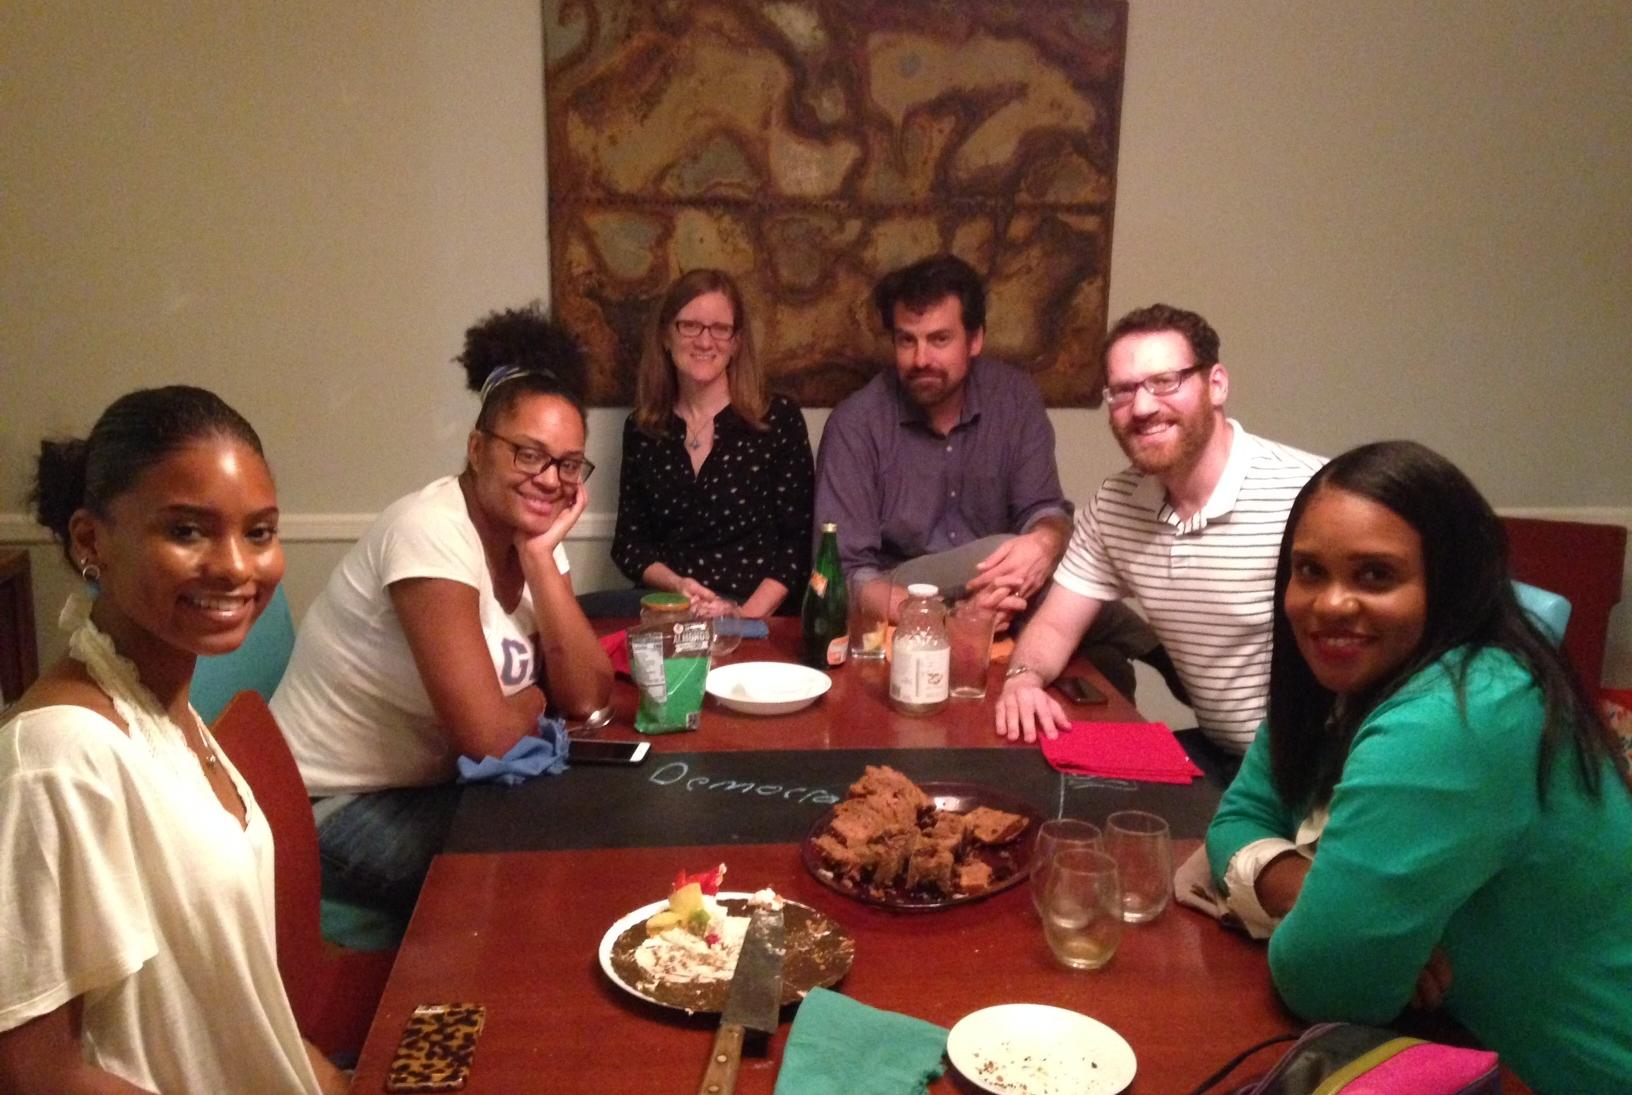 Kenedi, Ayana, Deborah, Jeff, Stephen, Toiya - Photo: Susan Haig